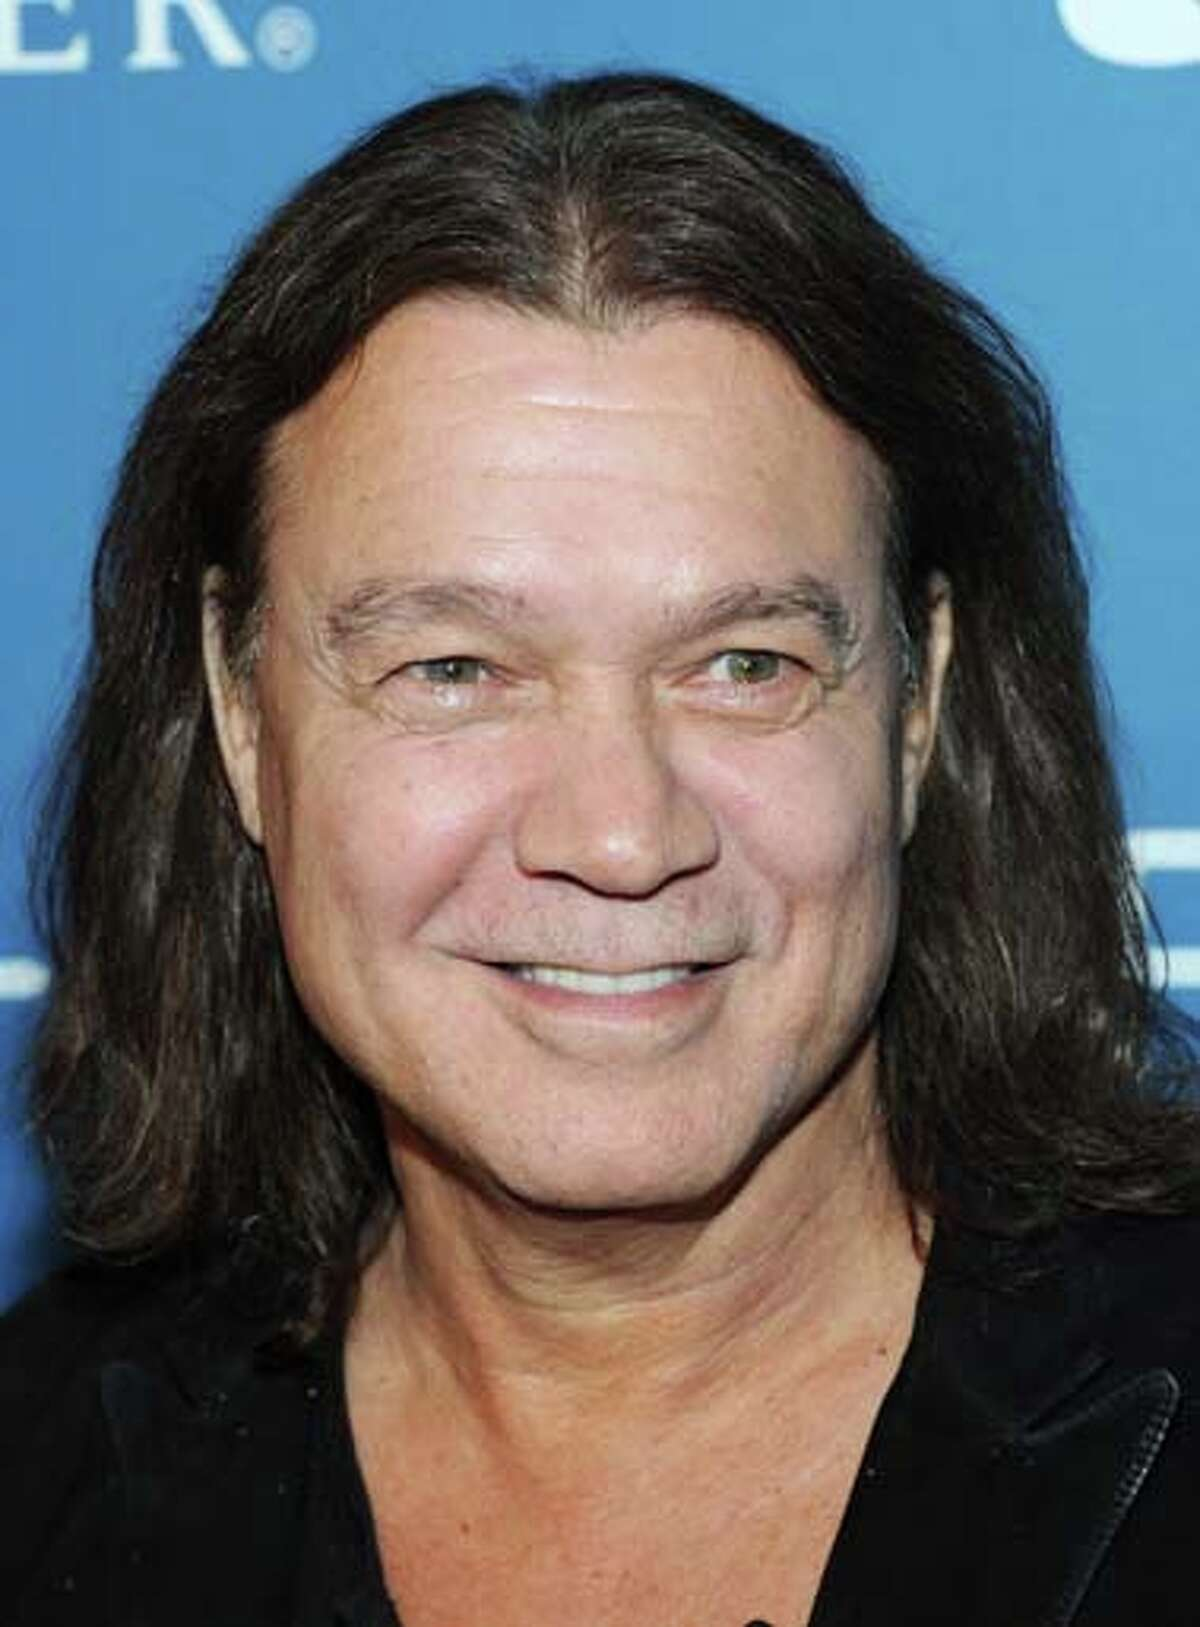 Musician Eddie Van Halen Born January 26, 1955